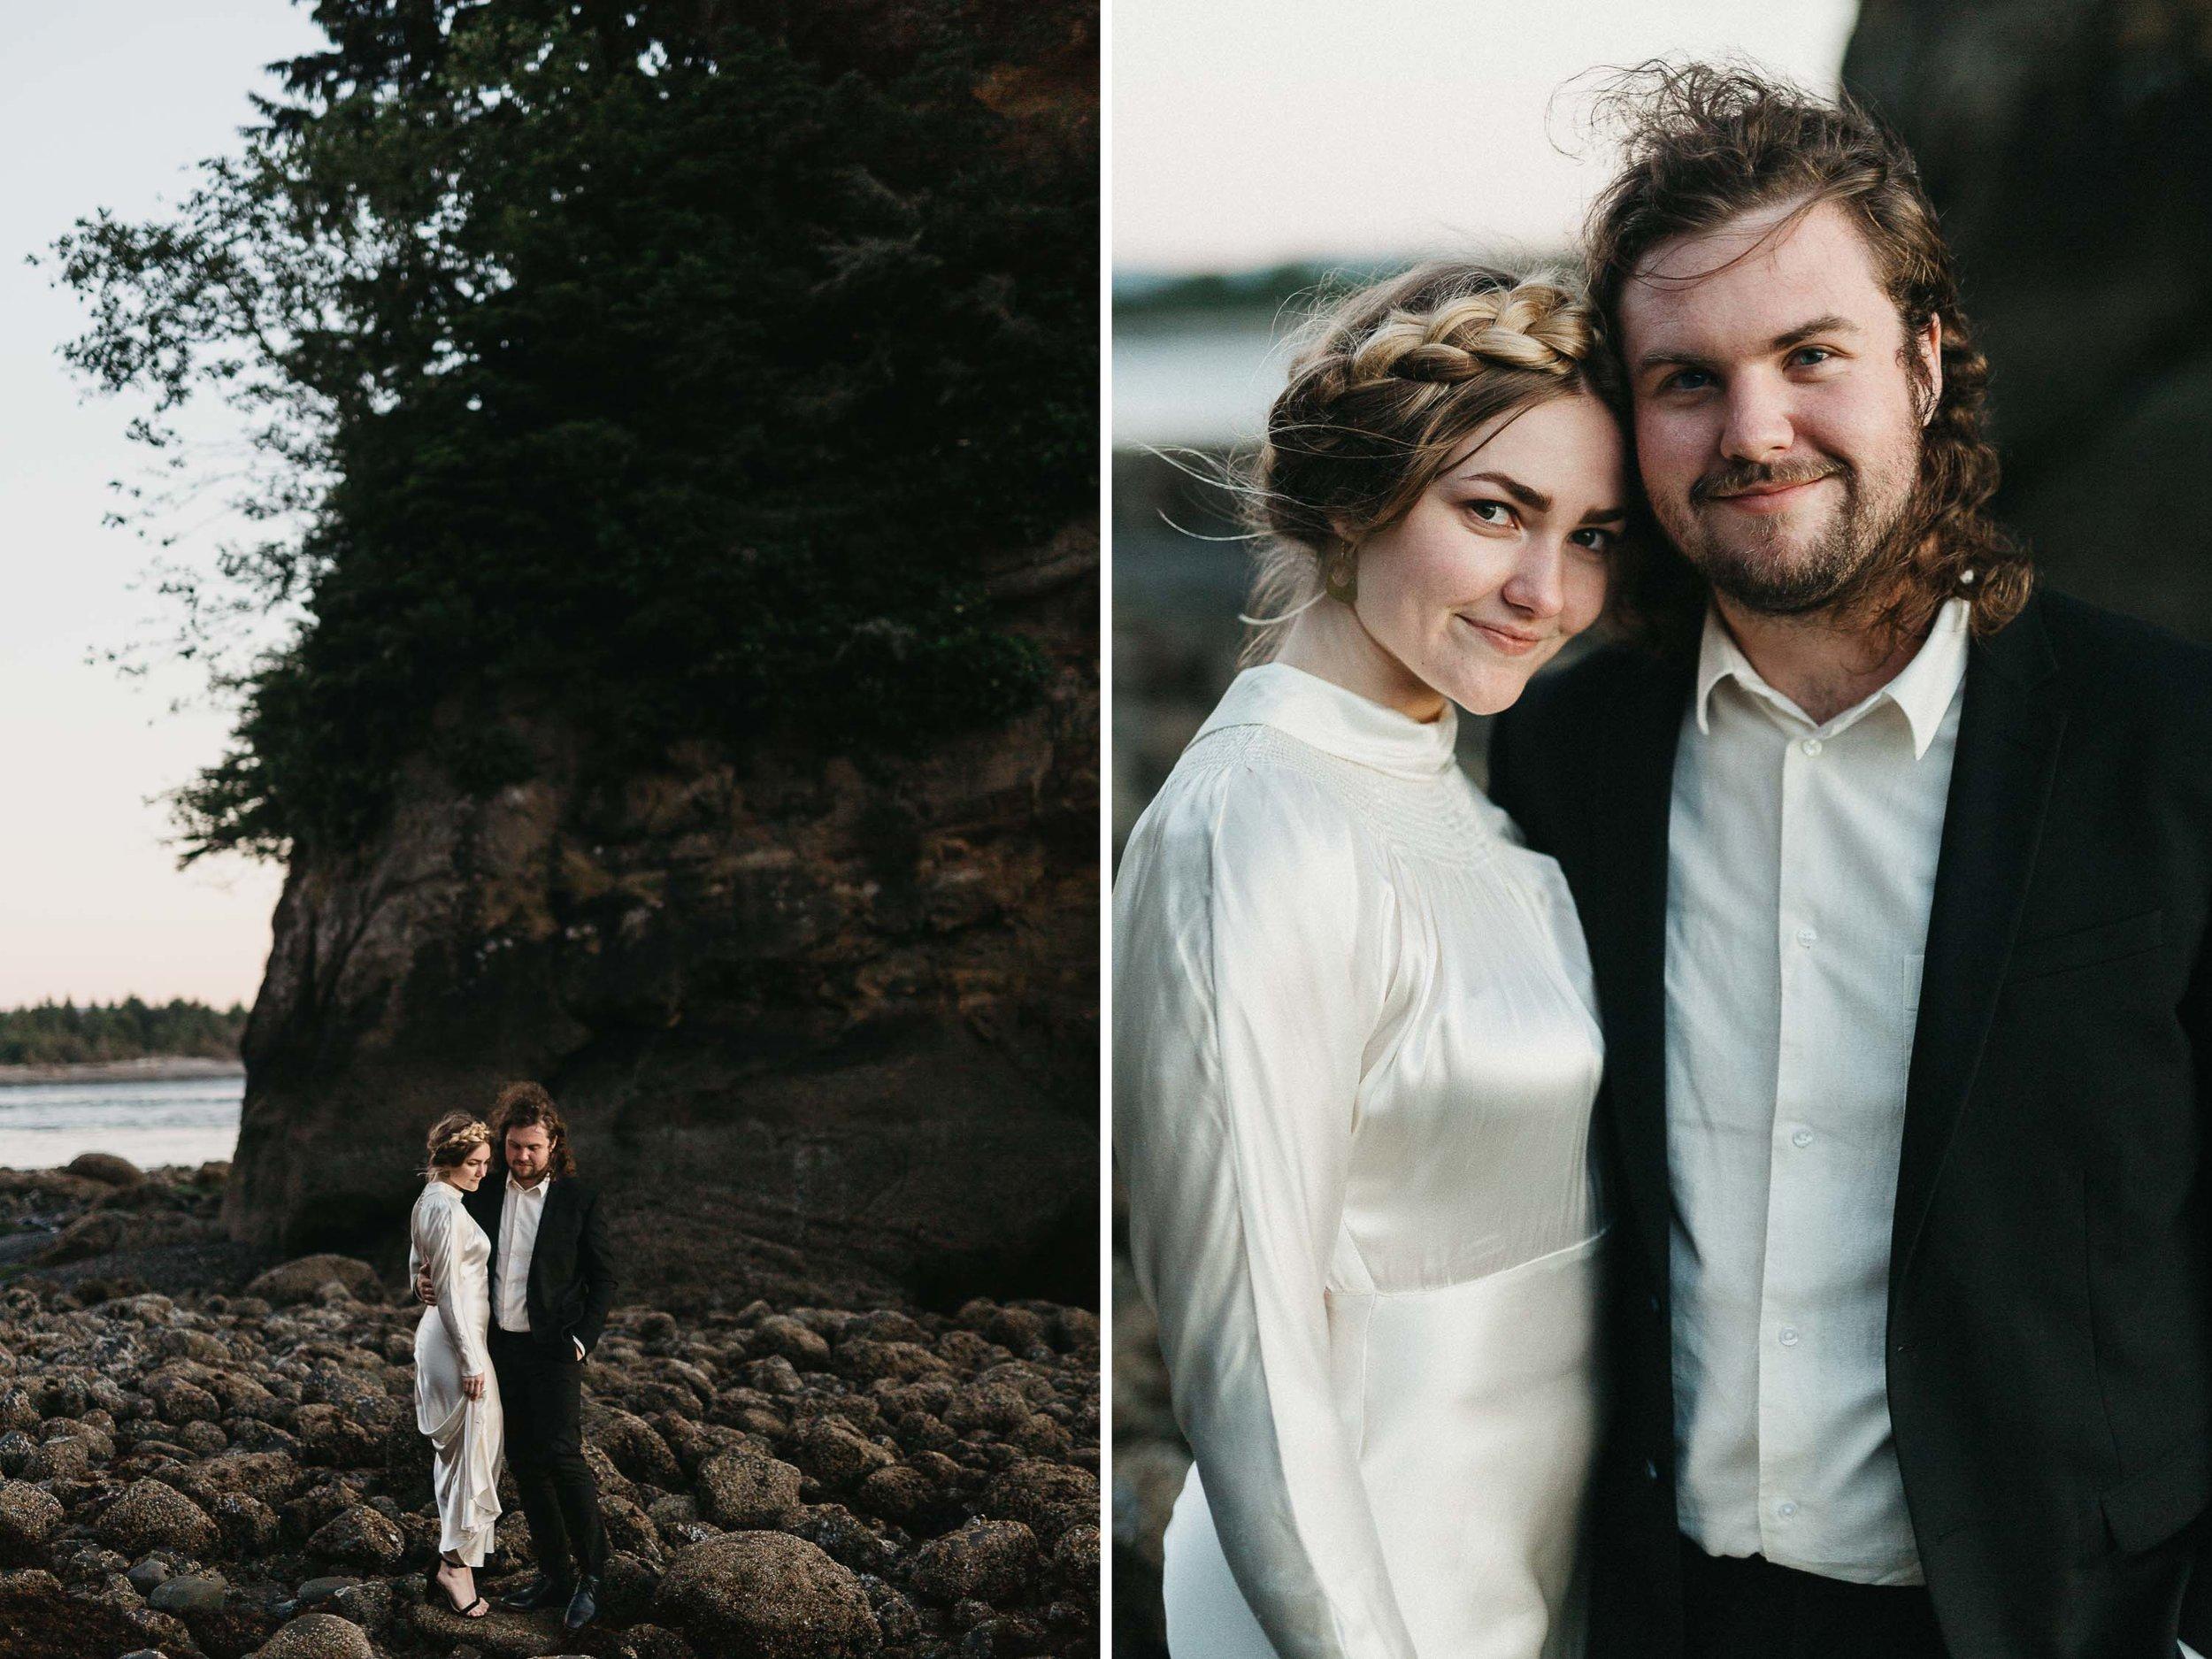 Oregon-Wedding-Photographer-05.jpg